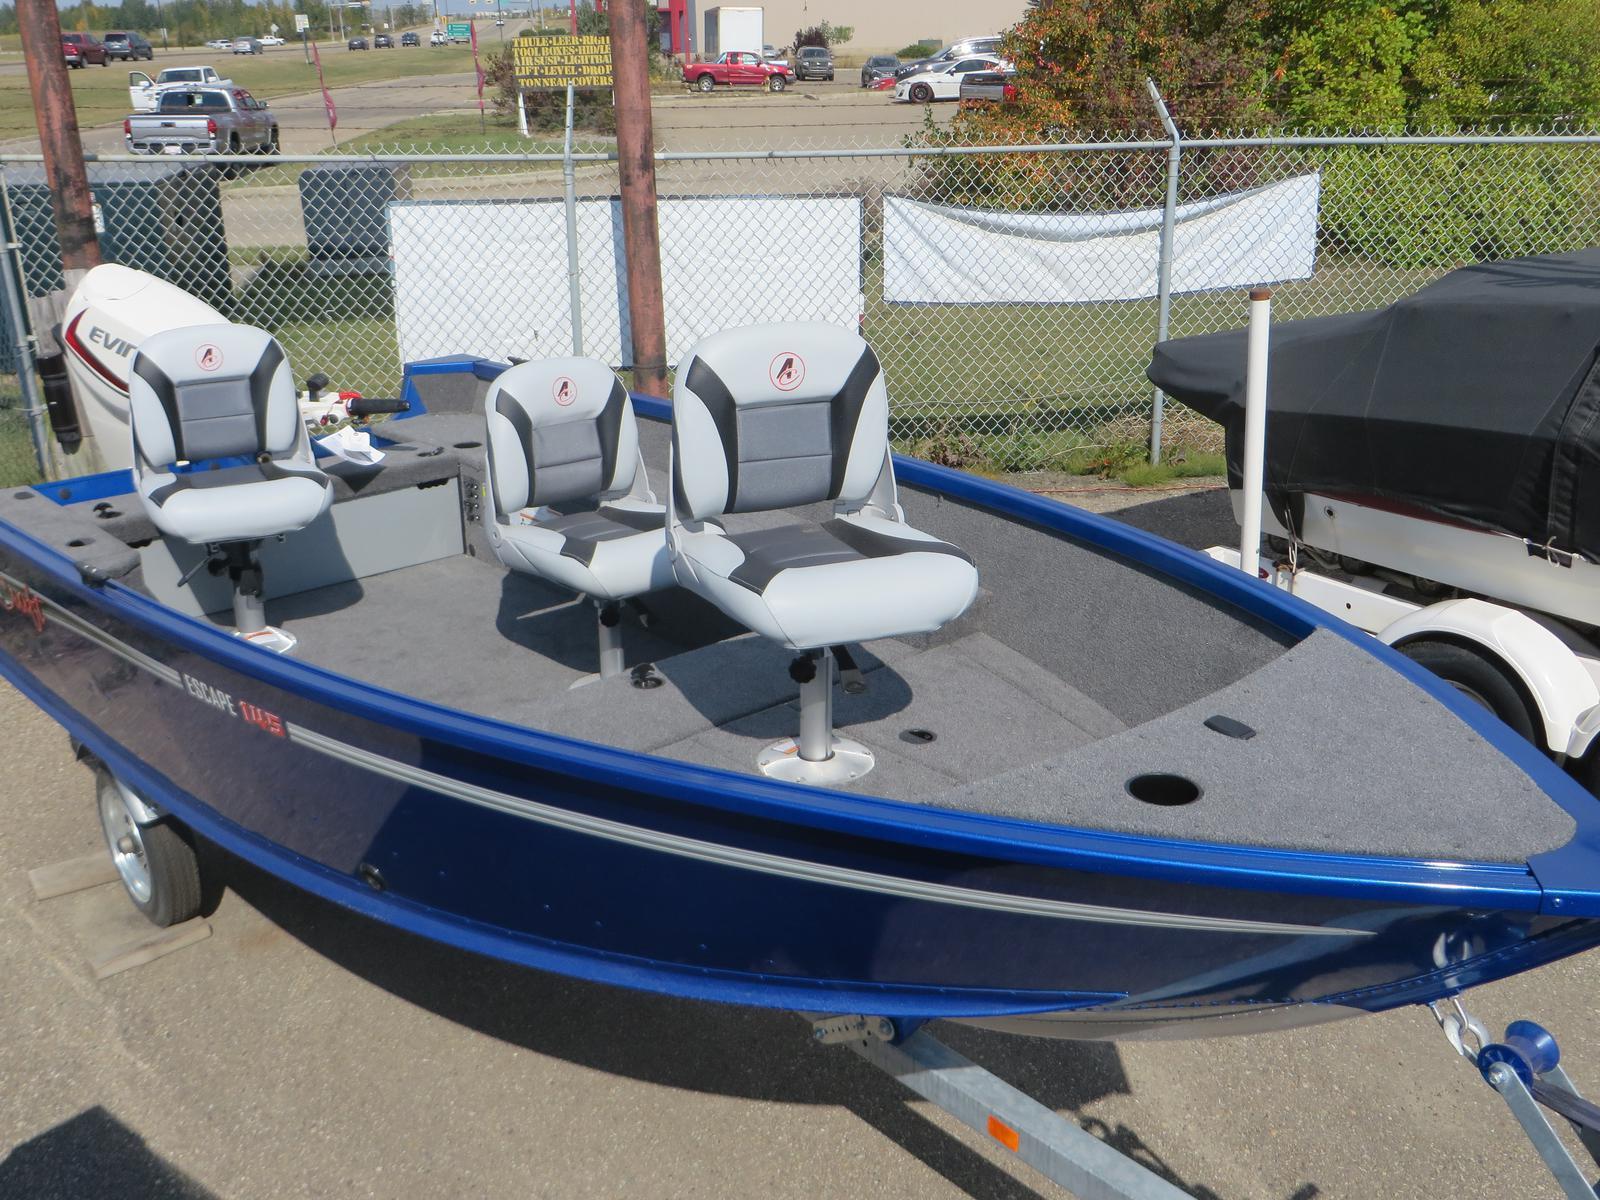 Inventory Boat Mart (Red Deer) Ltd  Red Deer, AB (403) 342-7015